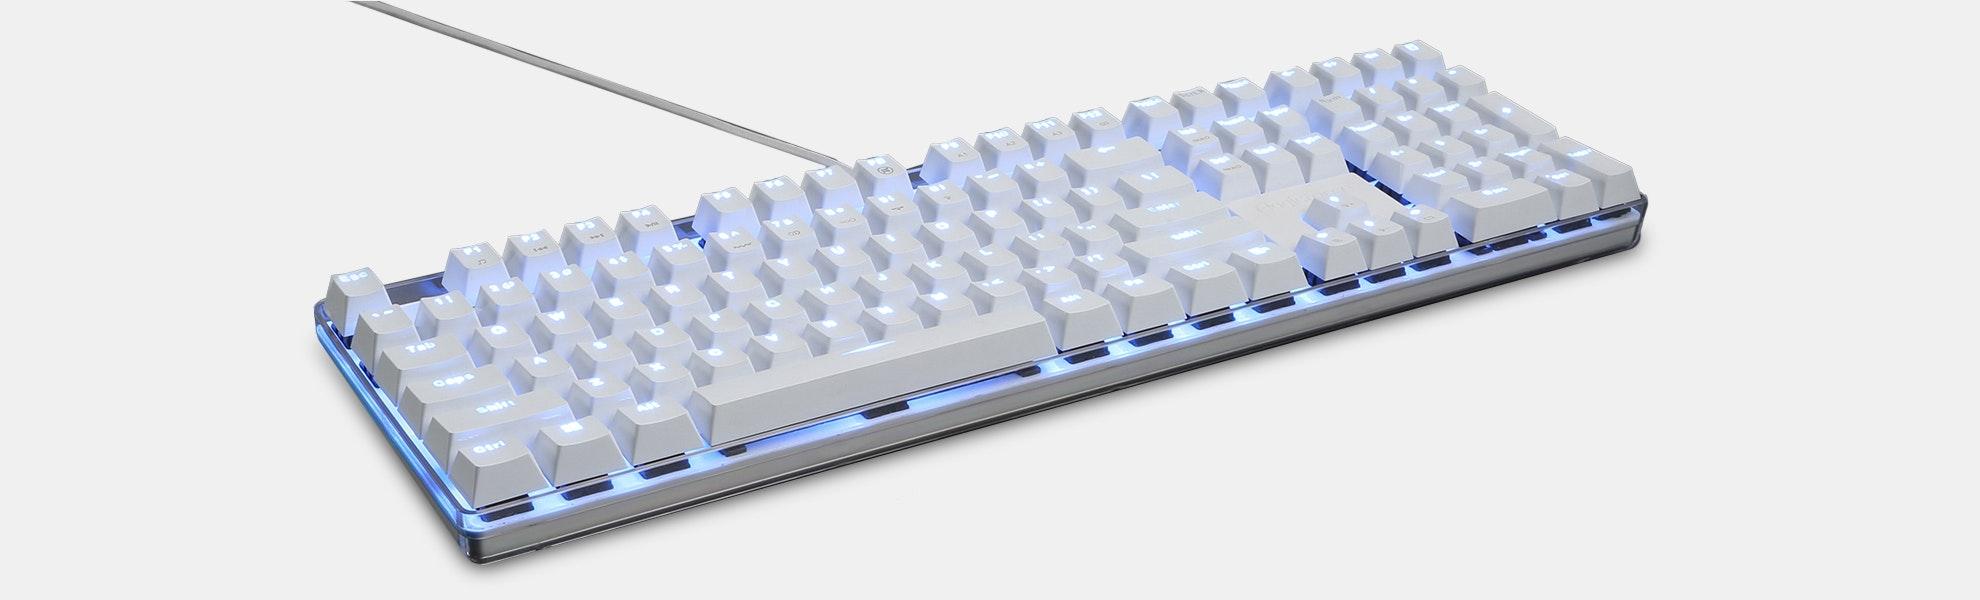 Magicforce Full Size Mechanical Keyboard